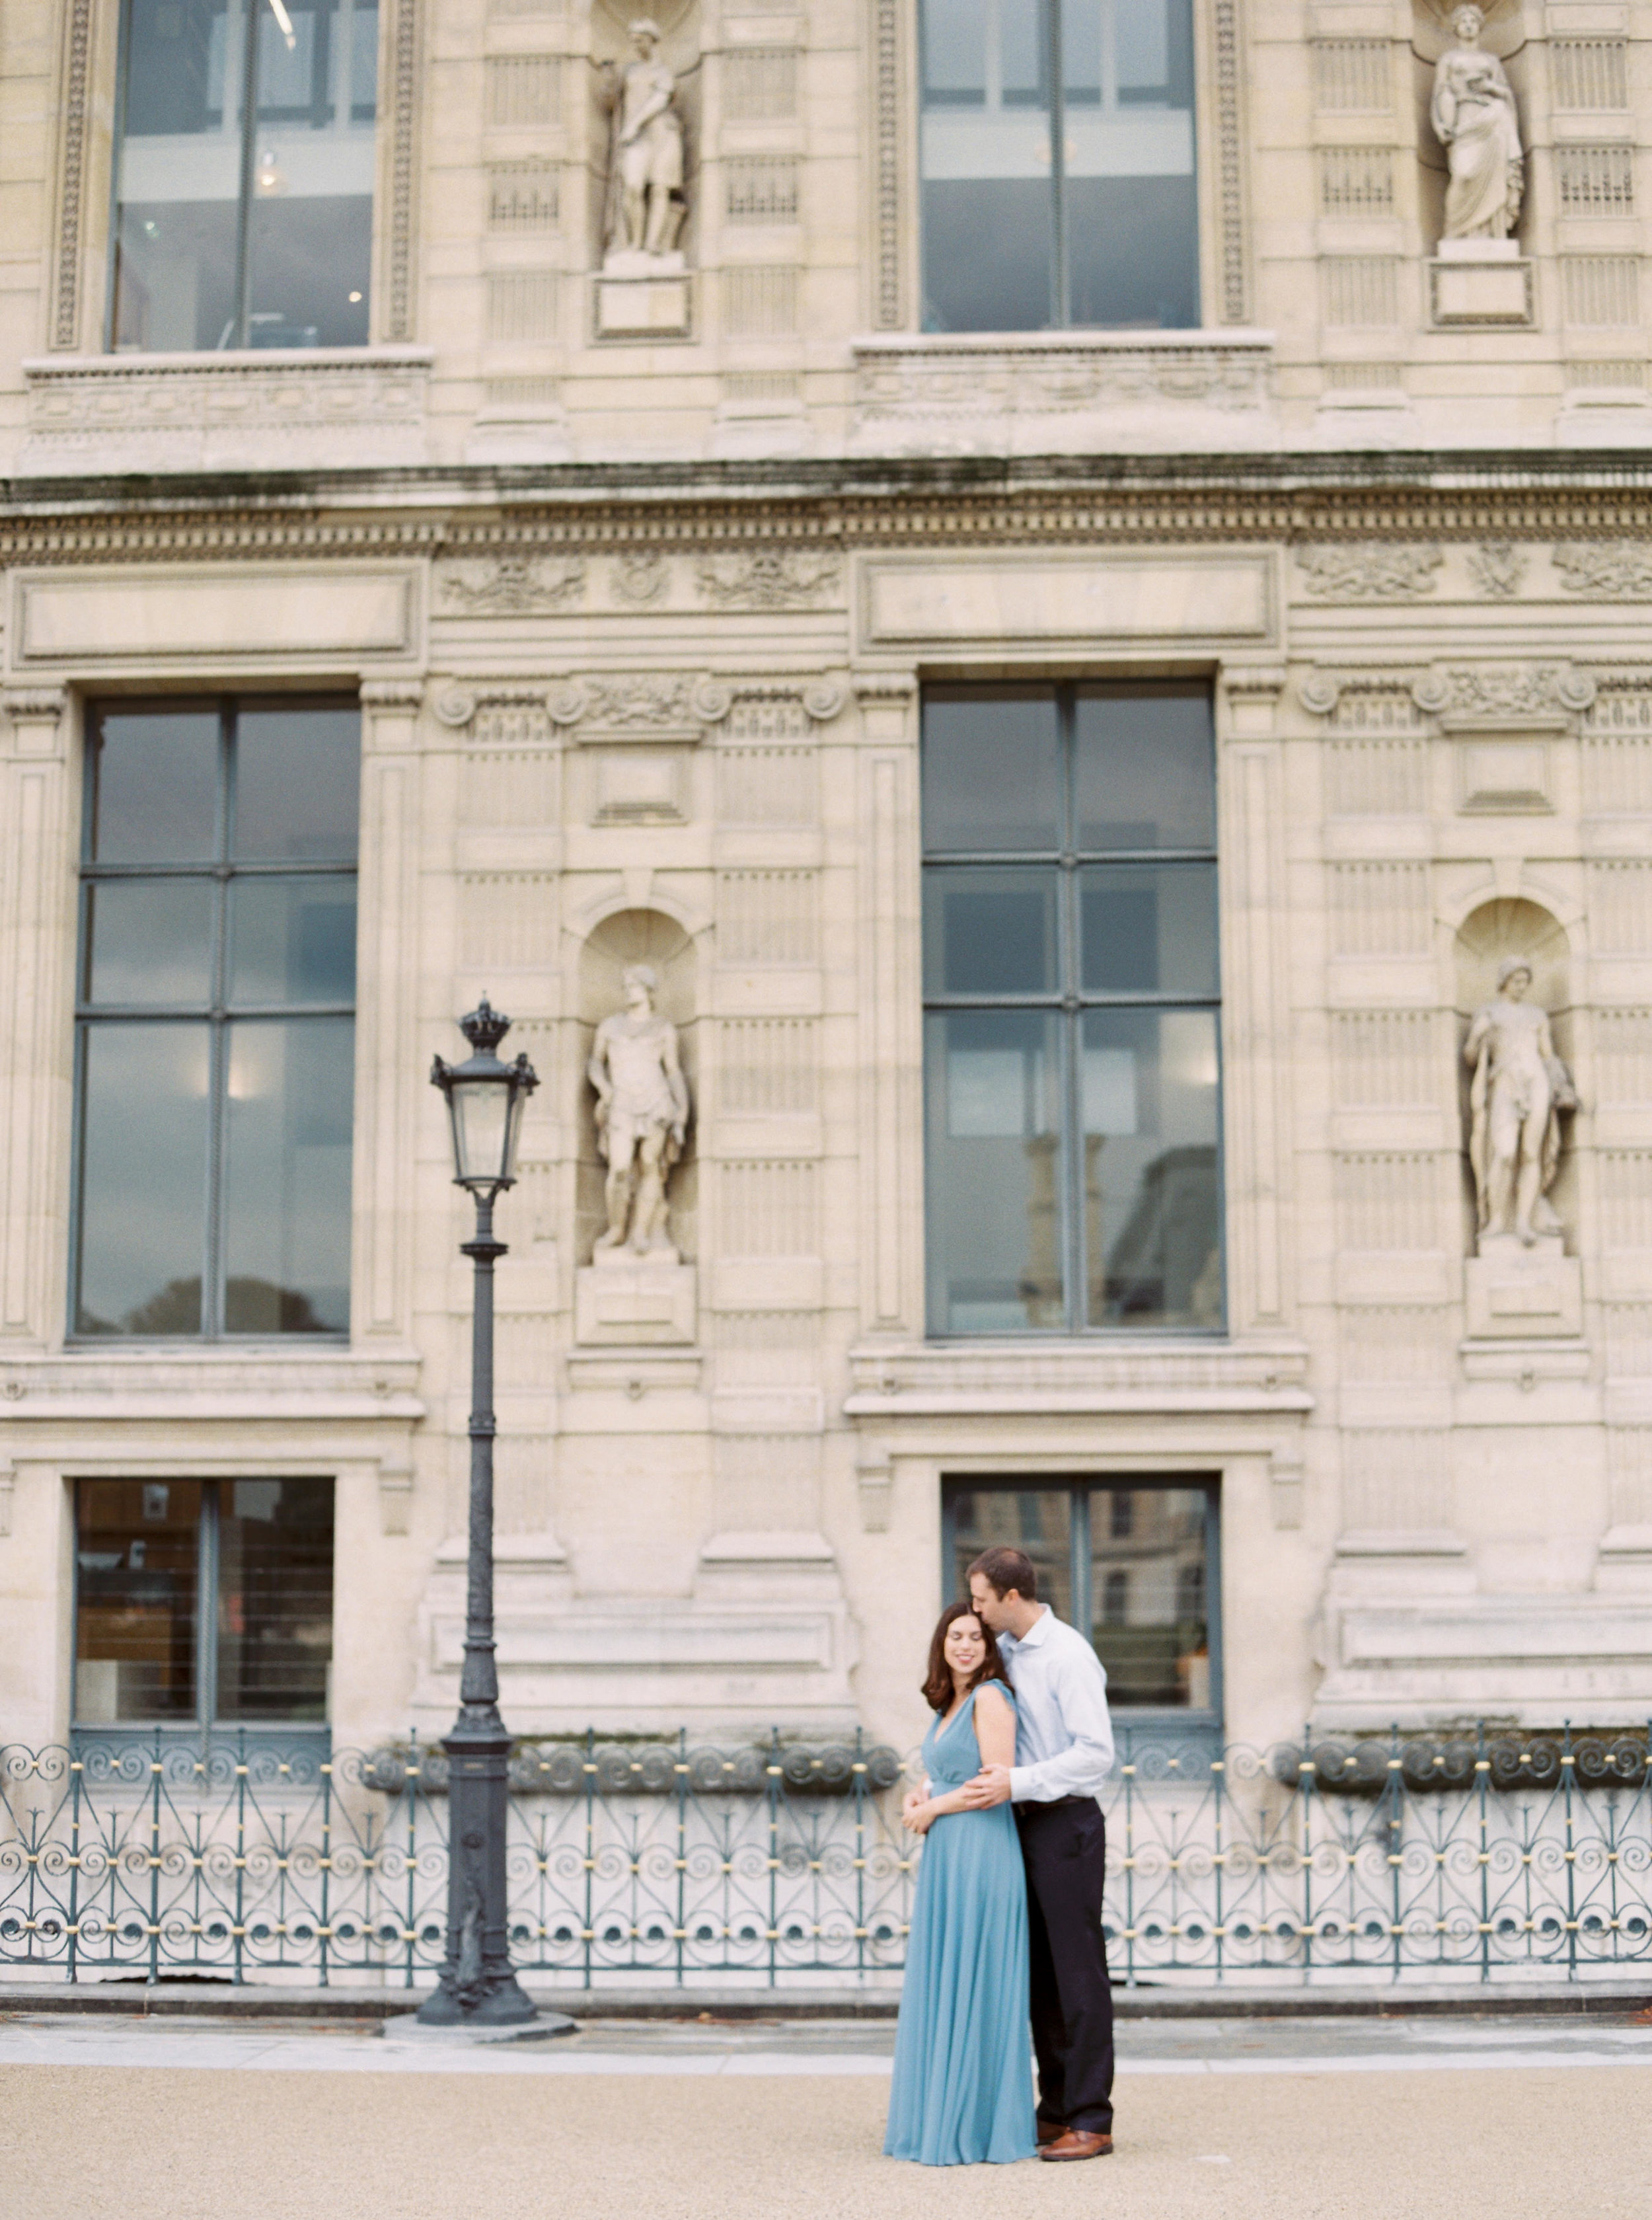 paris-france-wedding-photographer-destination-photographer-97.jpg